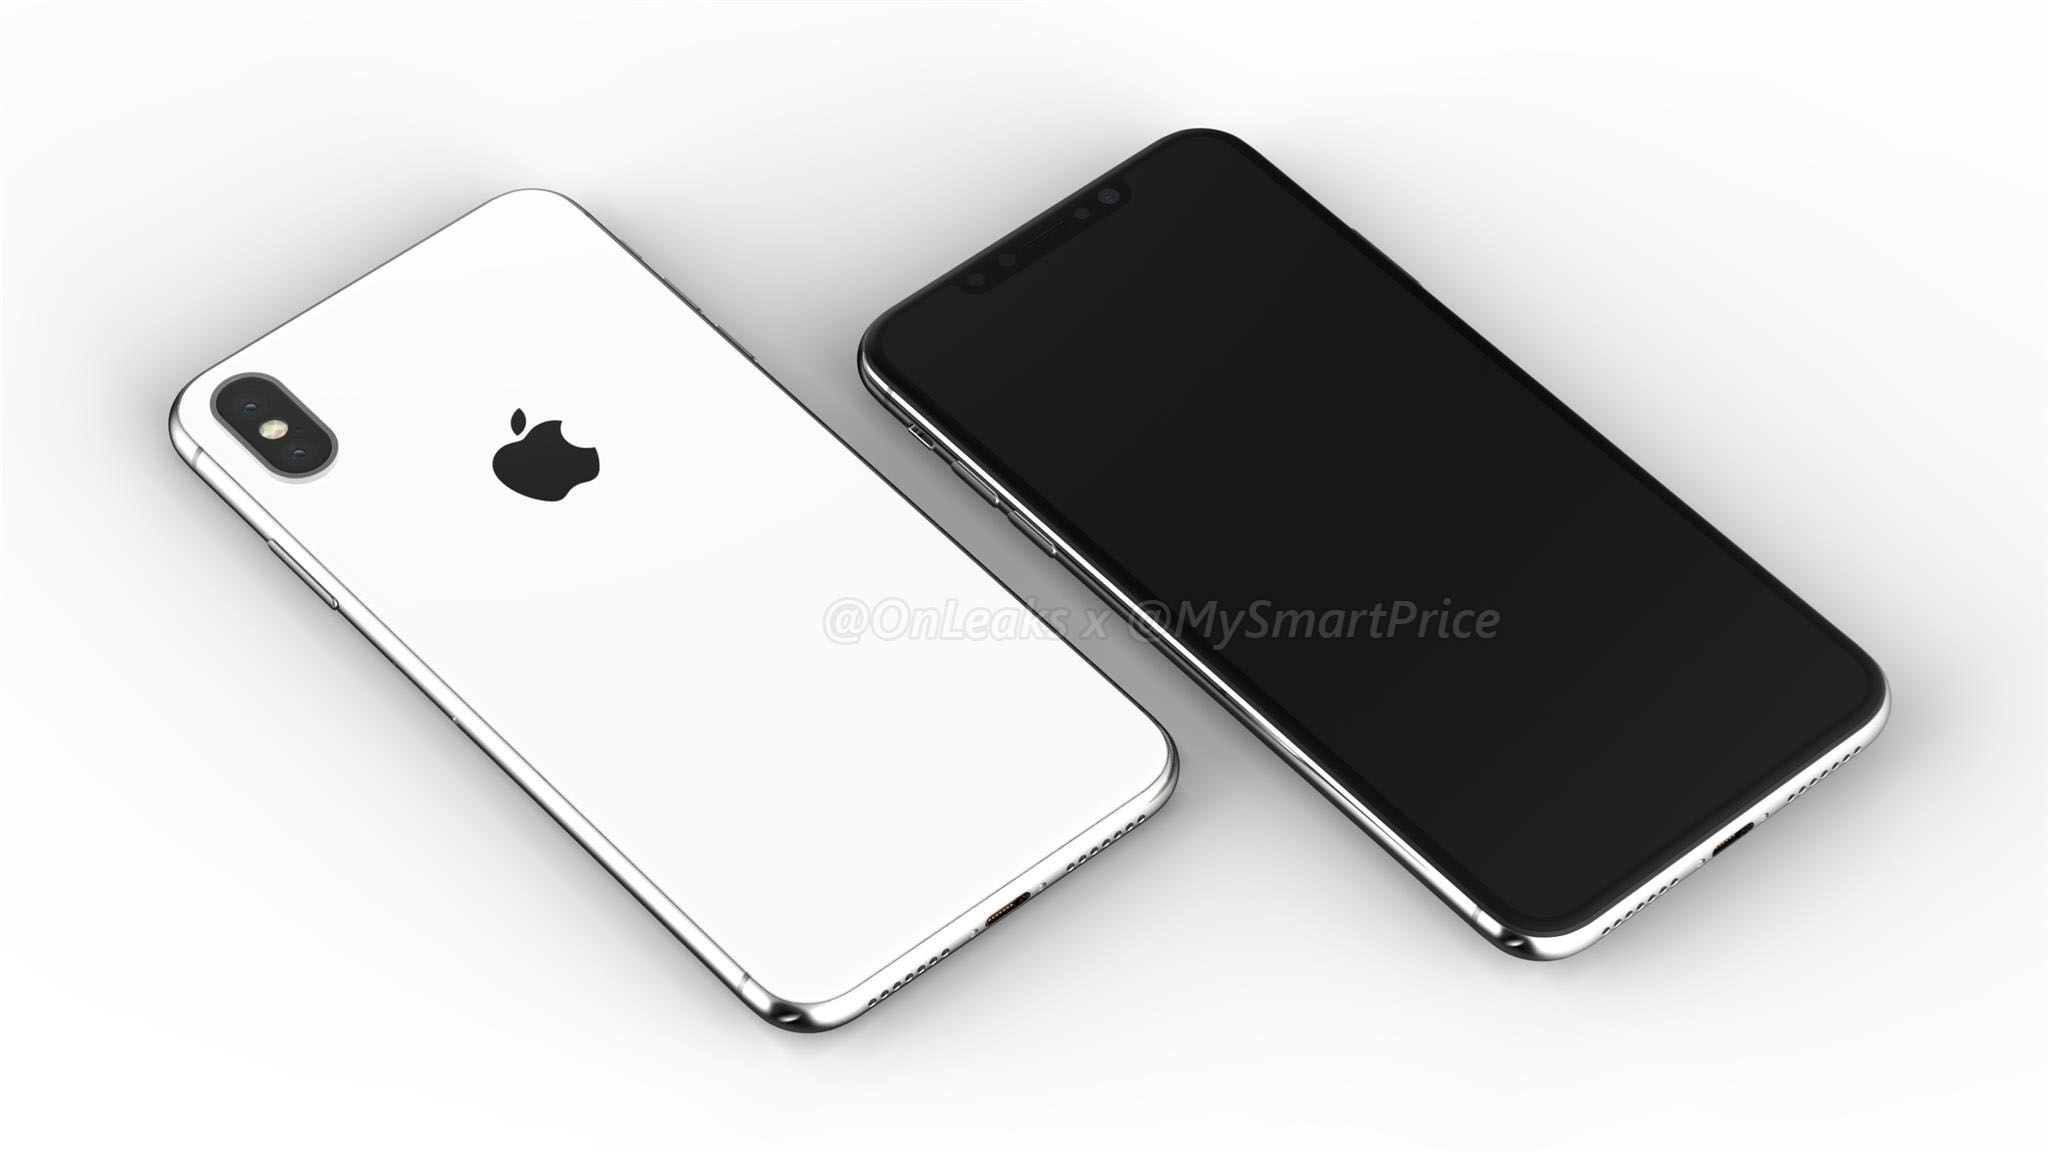 Apple-iPhone-X-Plus-6.5-inch-13-gatrea.ir